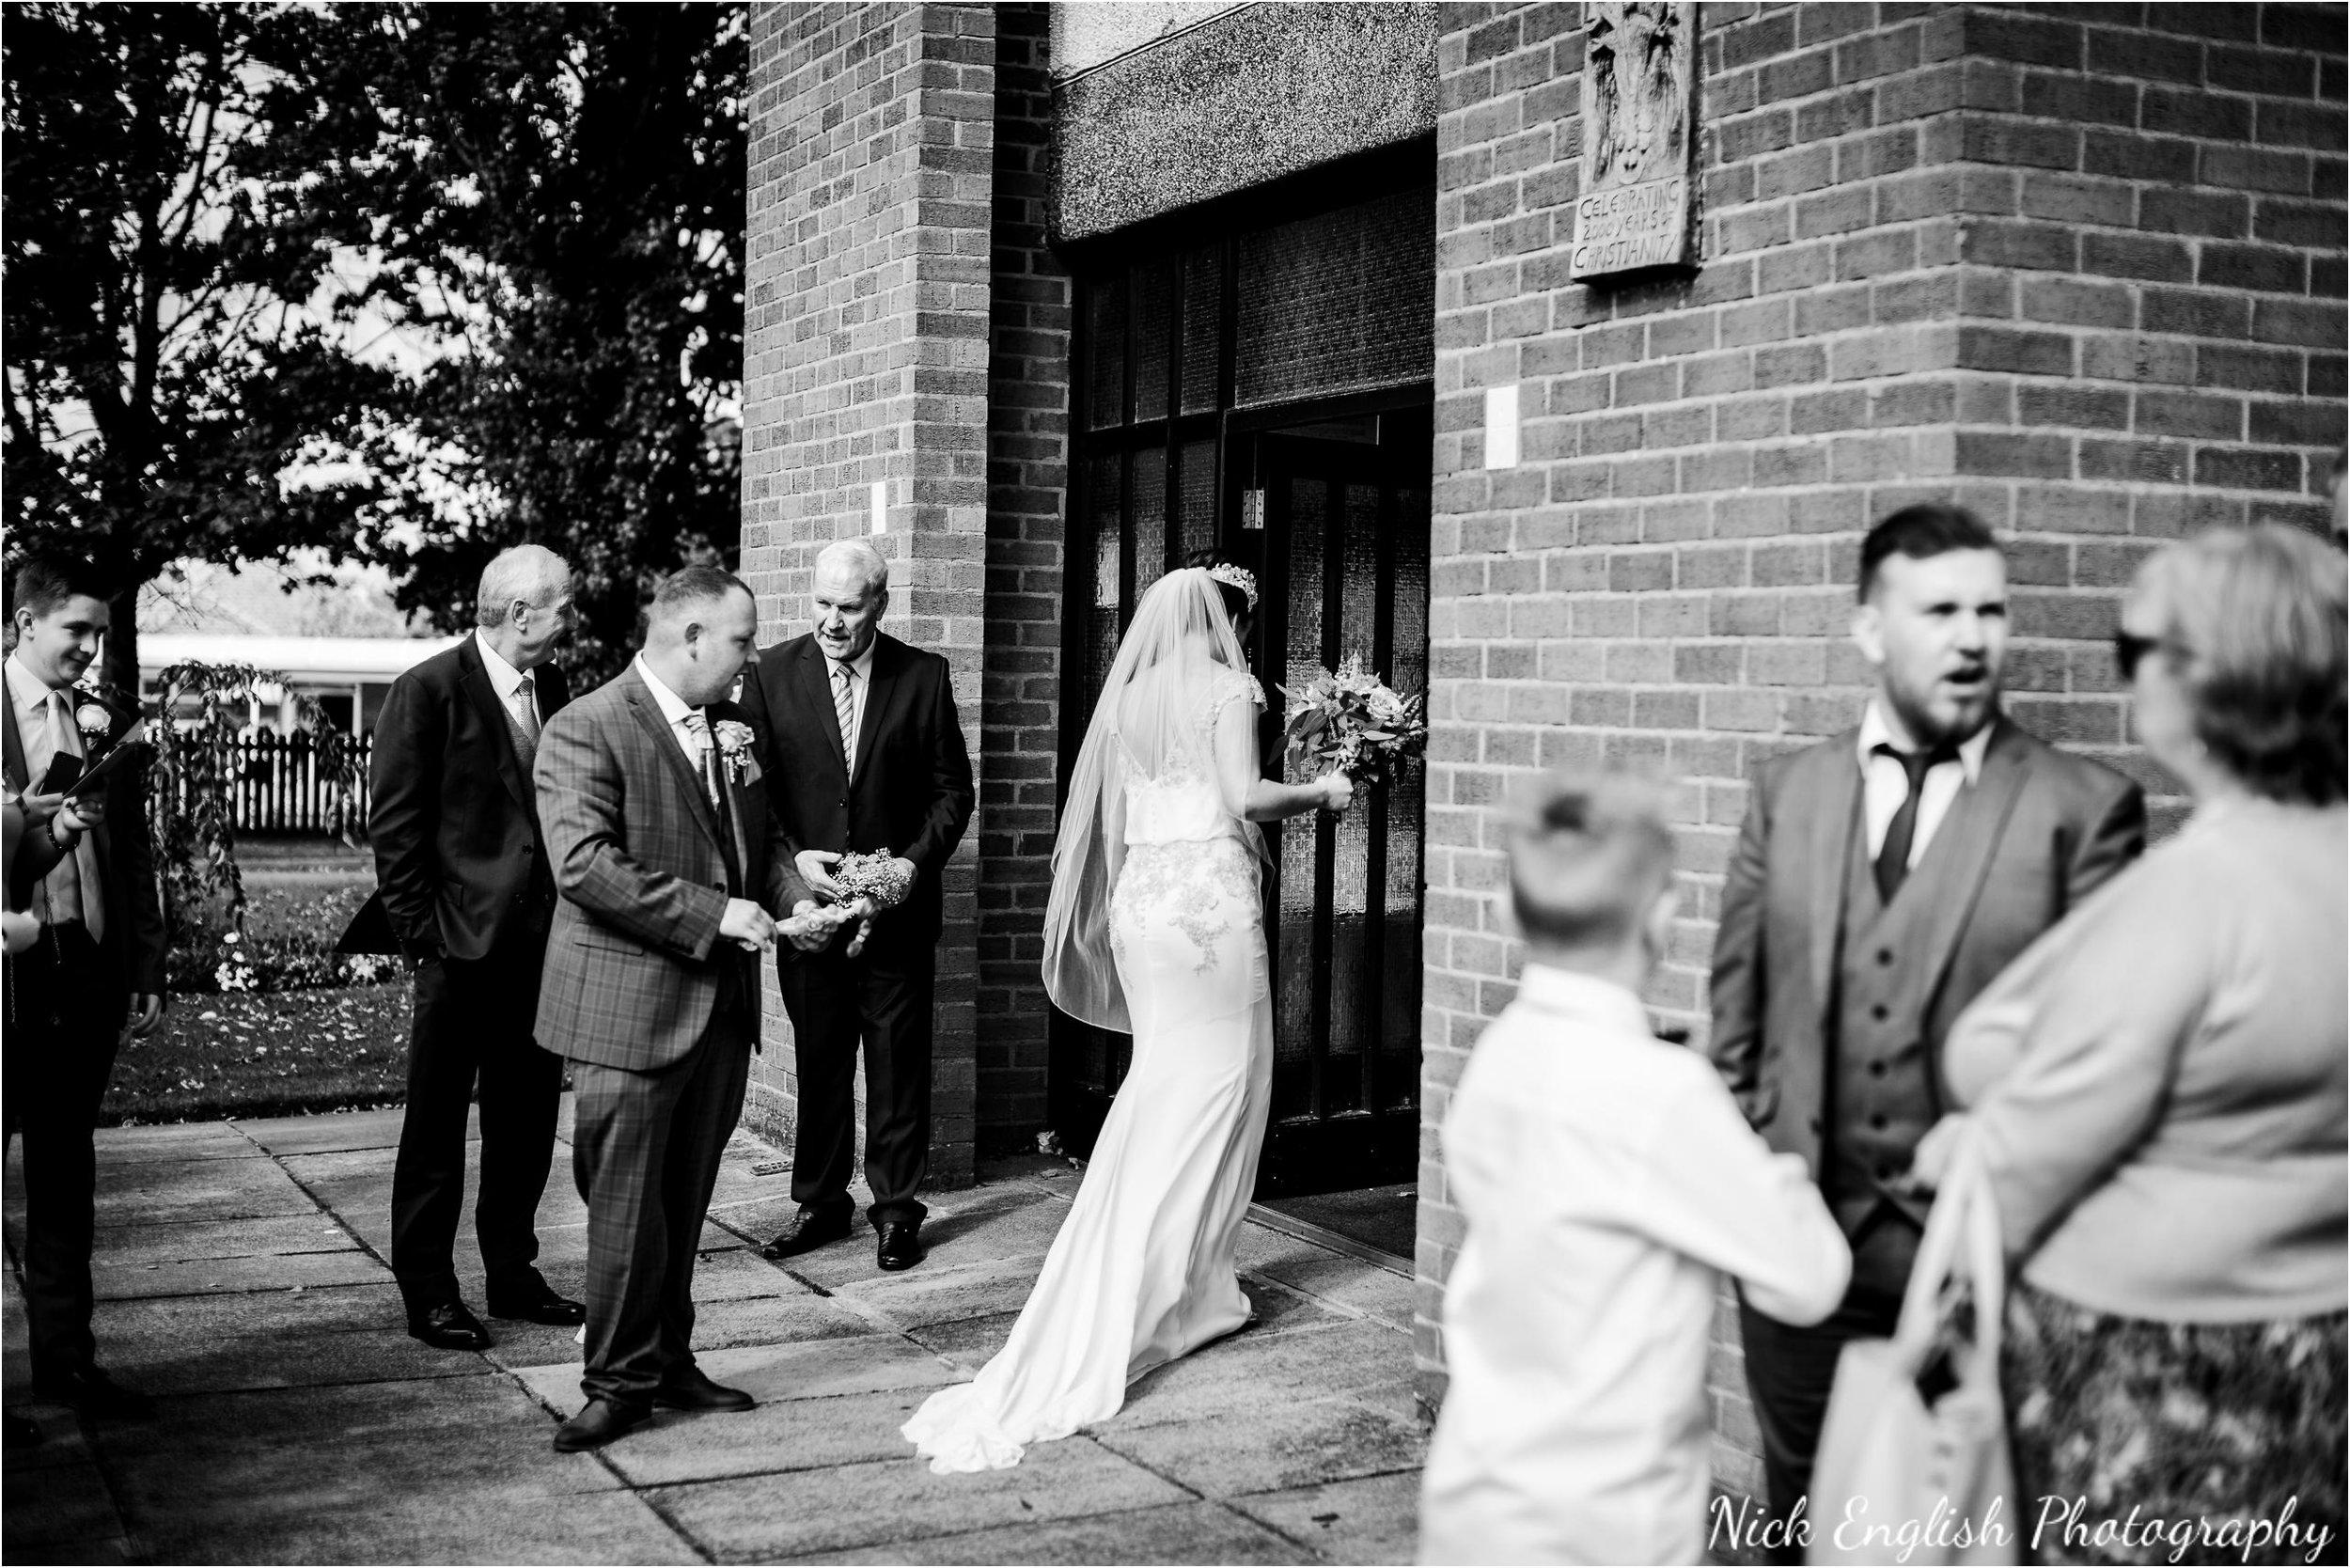 Stacey-Ash-Wedding-Photographs-Stanley-House-Preston-Lancashire-93.jpg